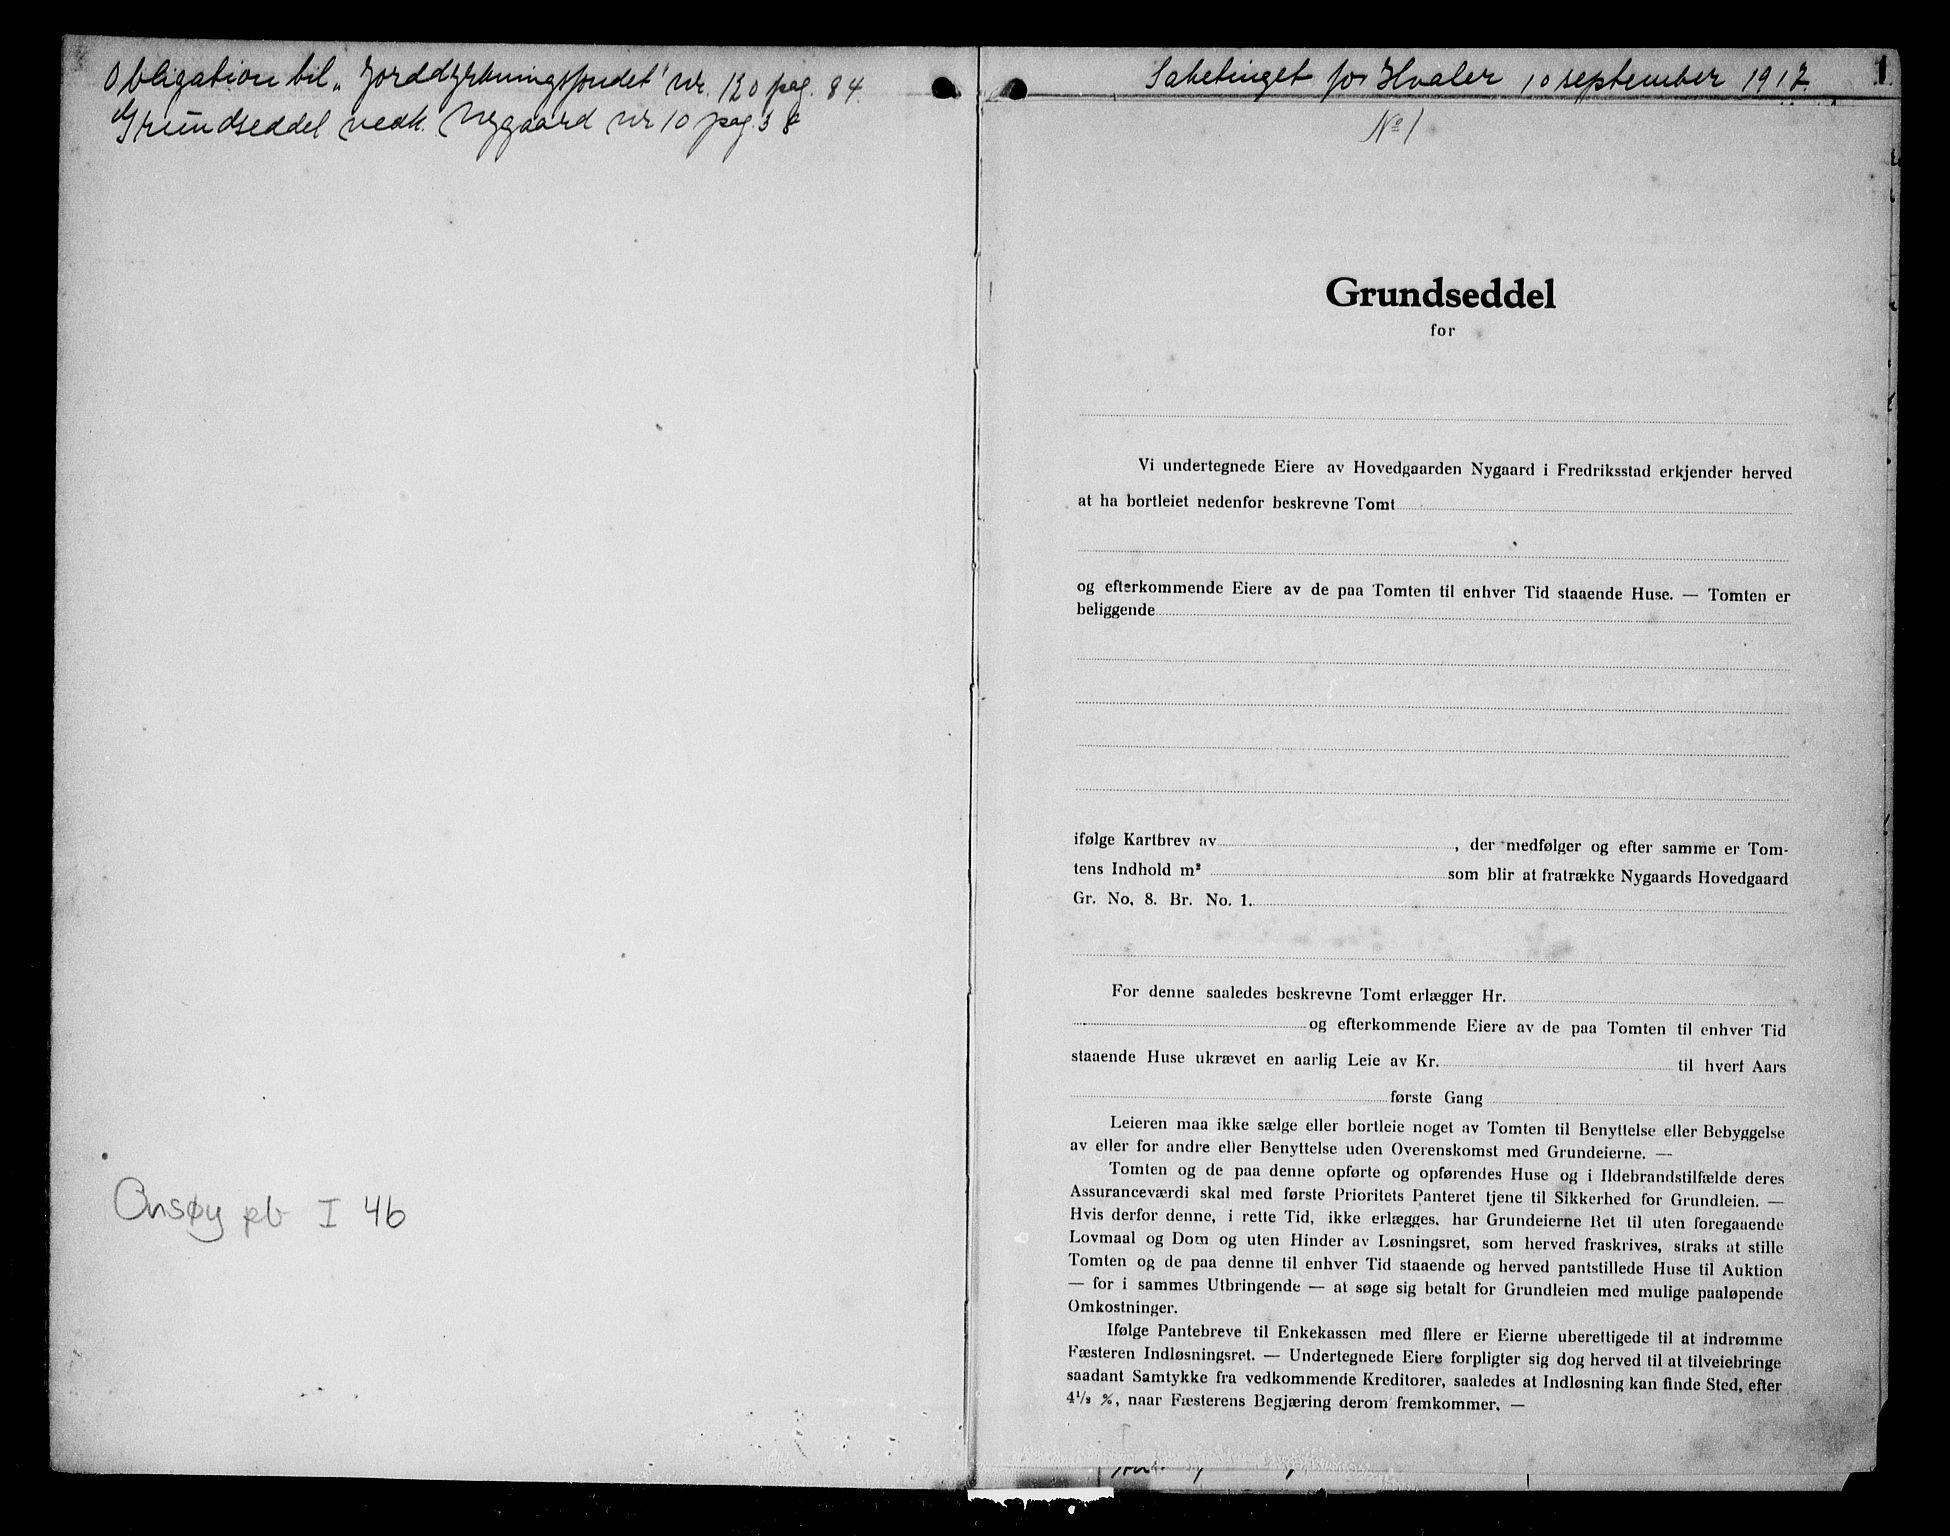 SAO, Onsøy sorenskriveri, G/Ga/Gaa/L0046: Pantebok nr. I 46, 1917-1918